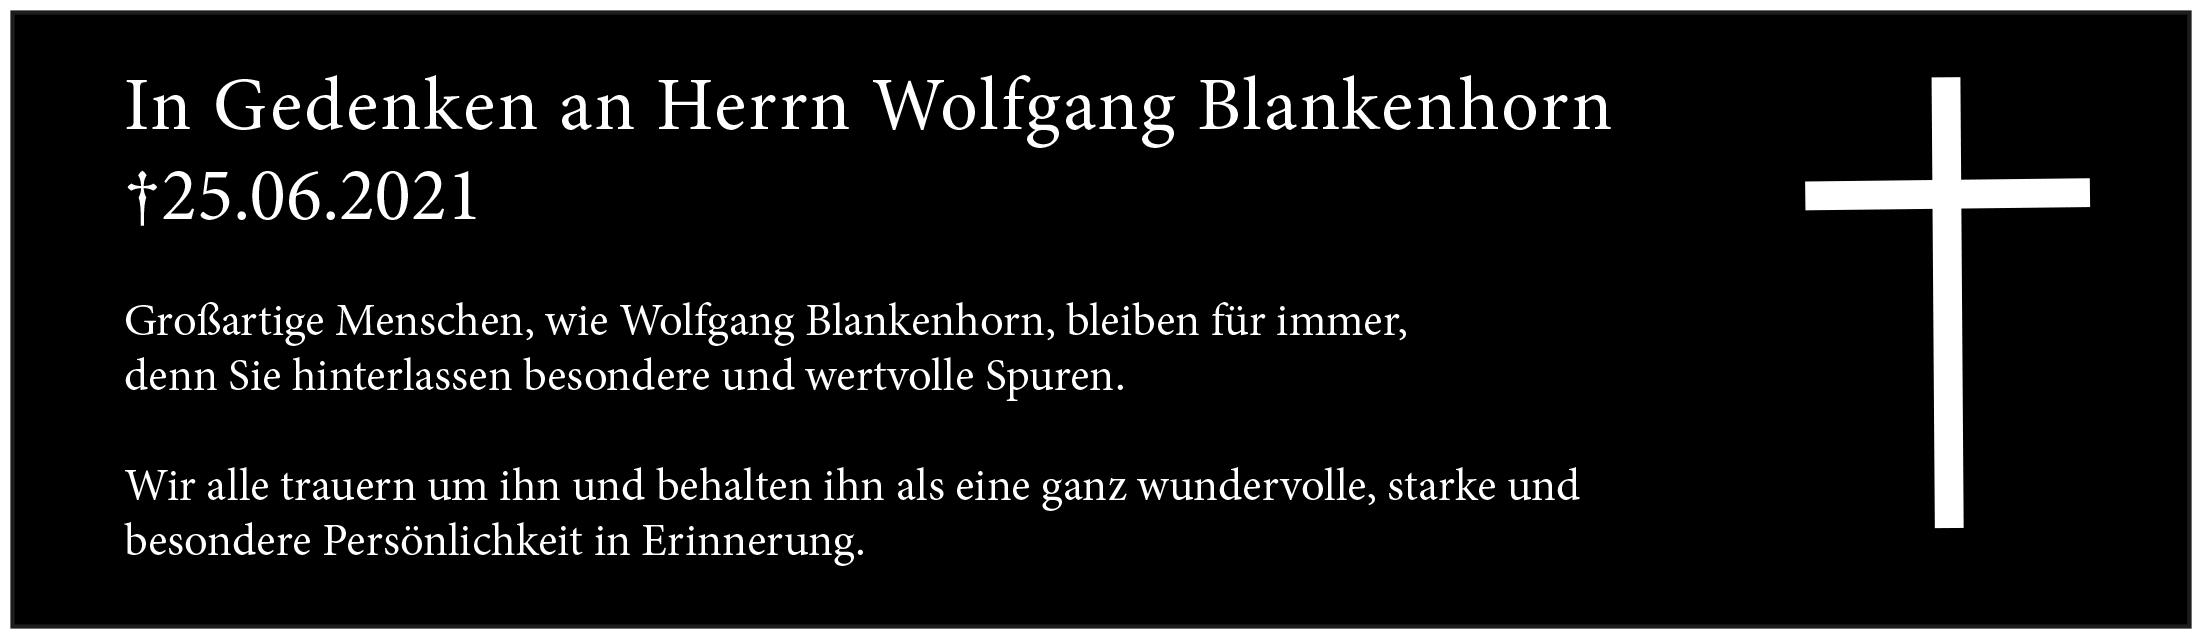 In-Gedenken-an-Herrn-Wolfgang-Blankenhorn